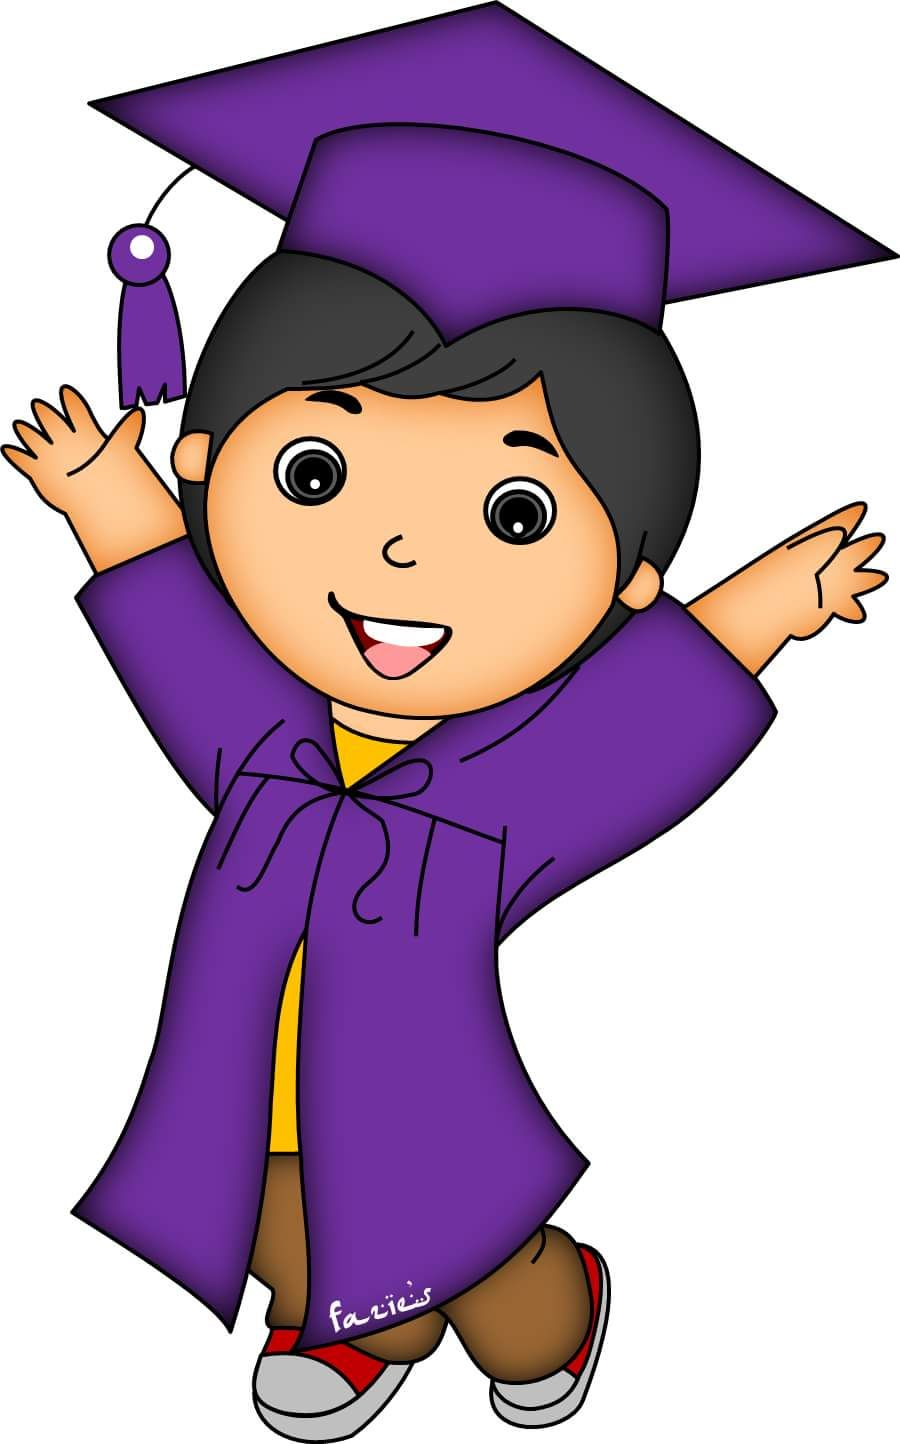 pin by pun klai on วันจบการศึกษา | graduation, kindergarten